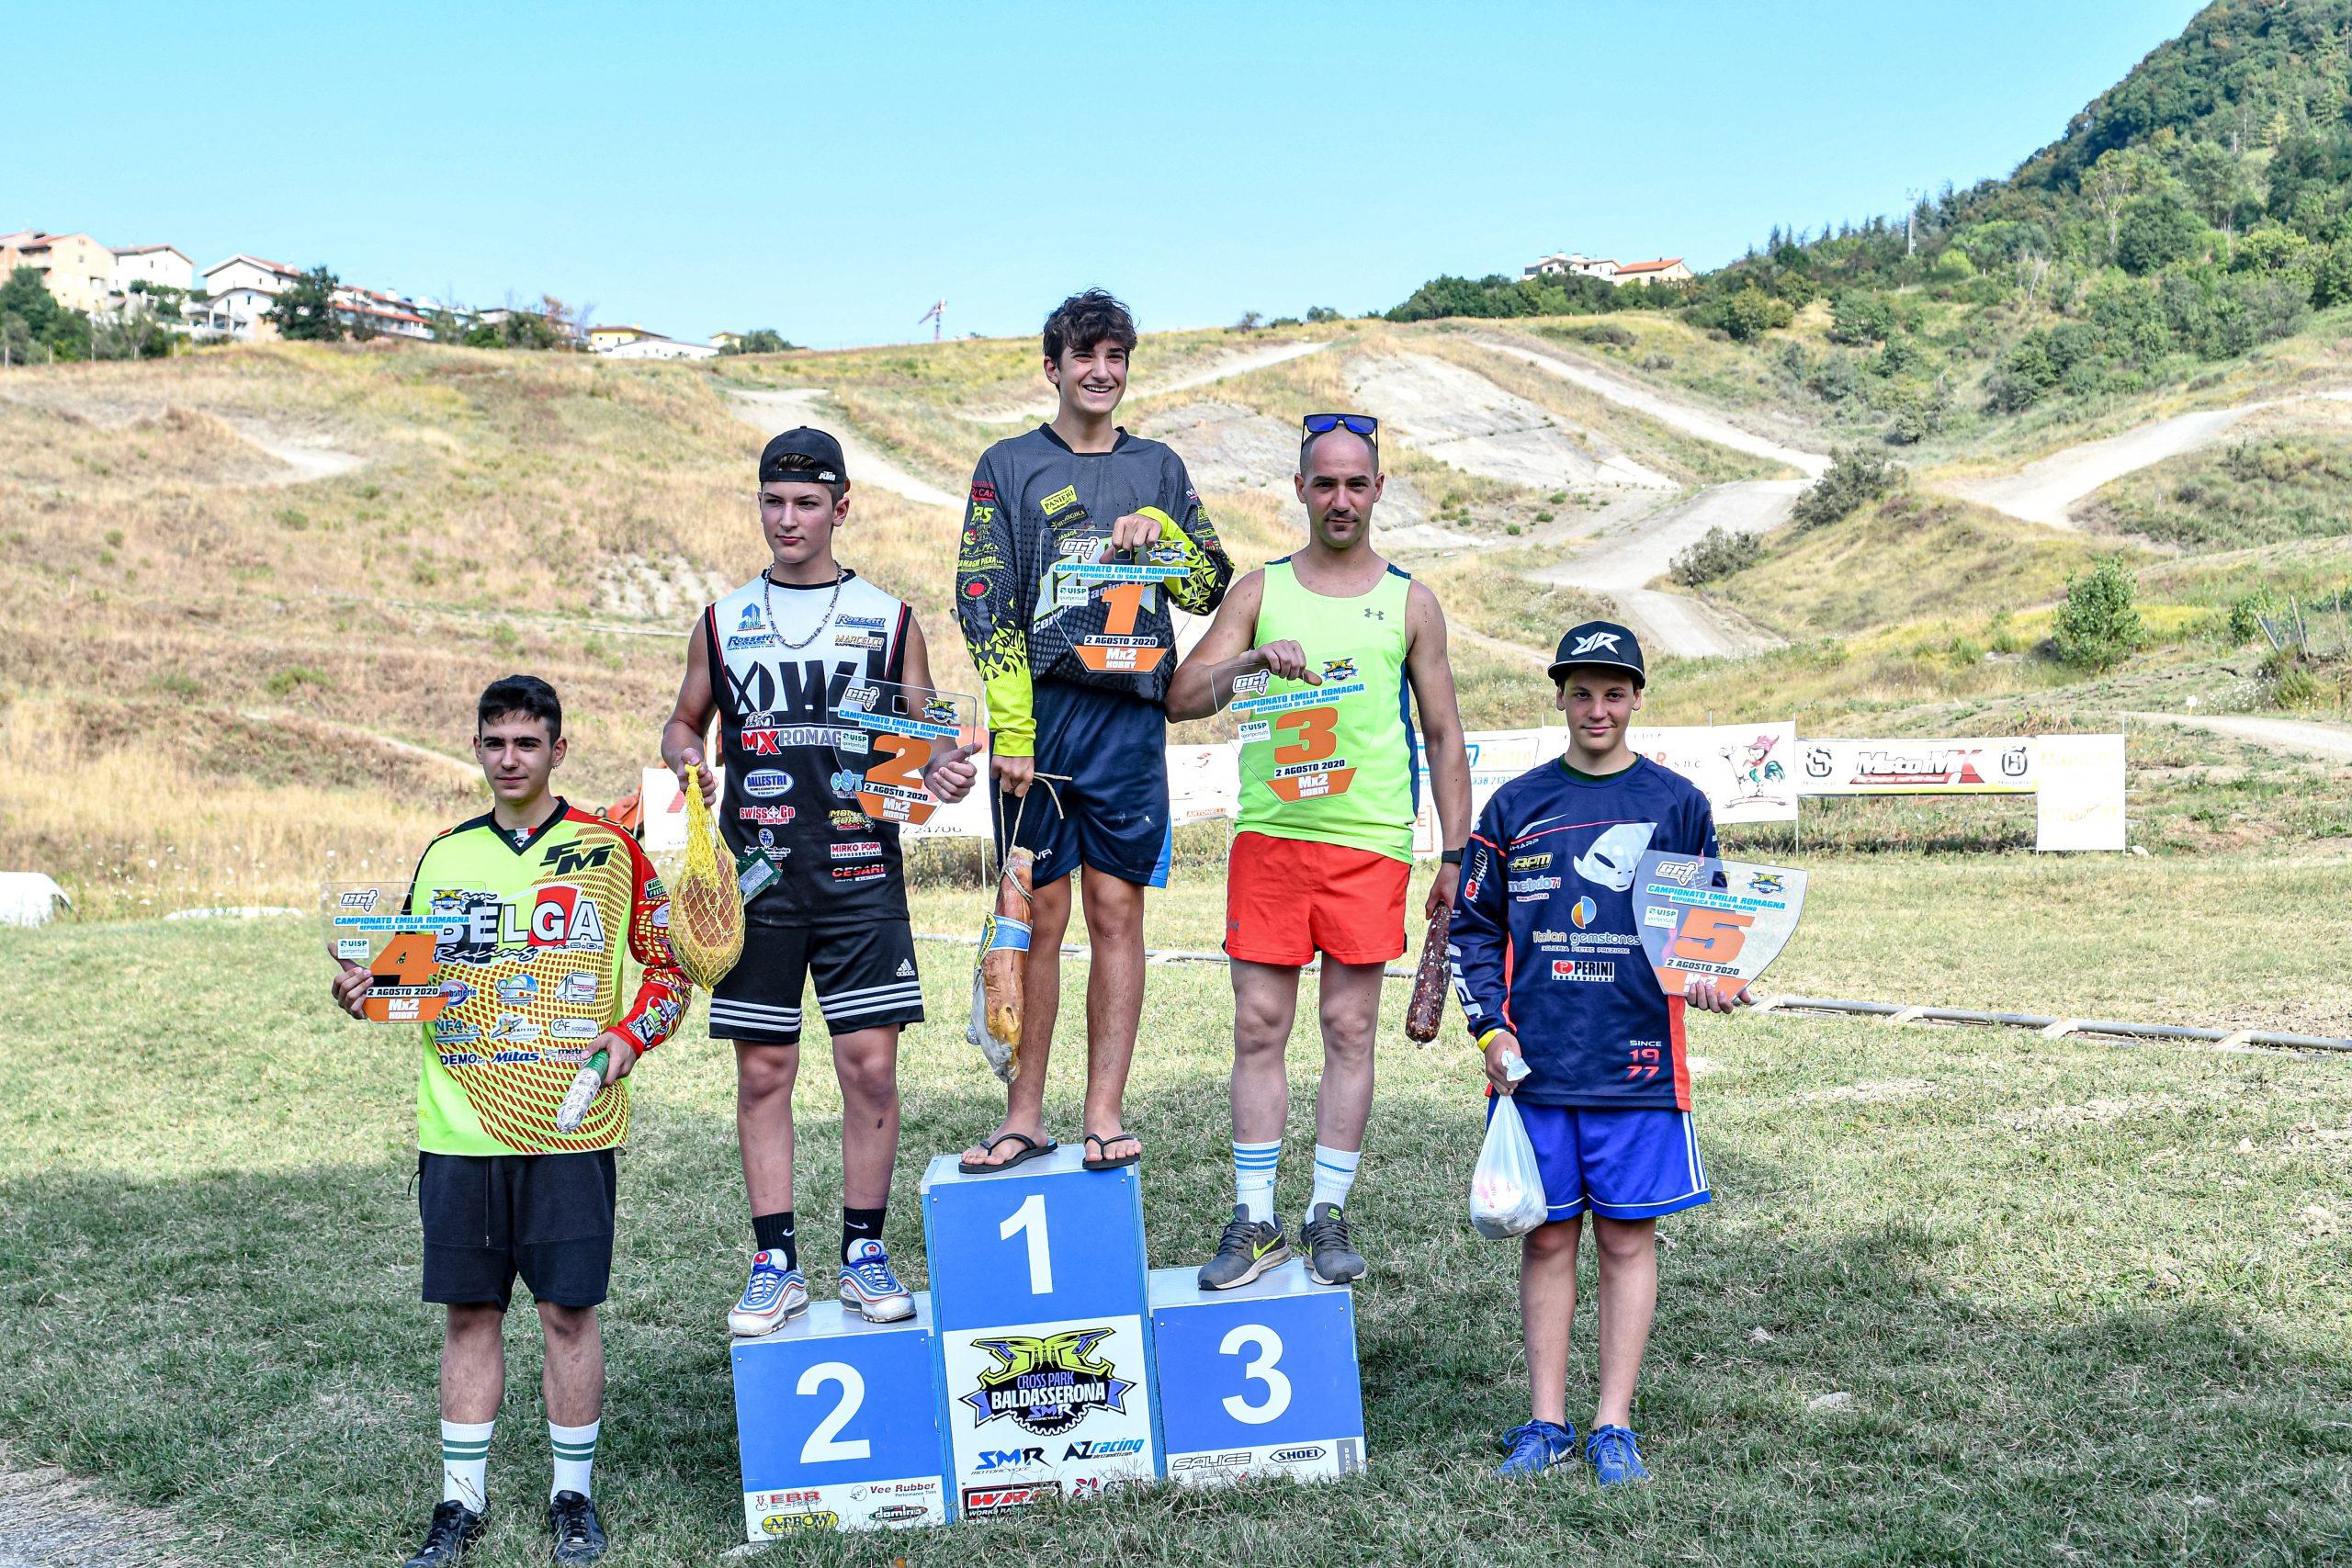 cereta-racing-team-2020-2